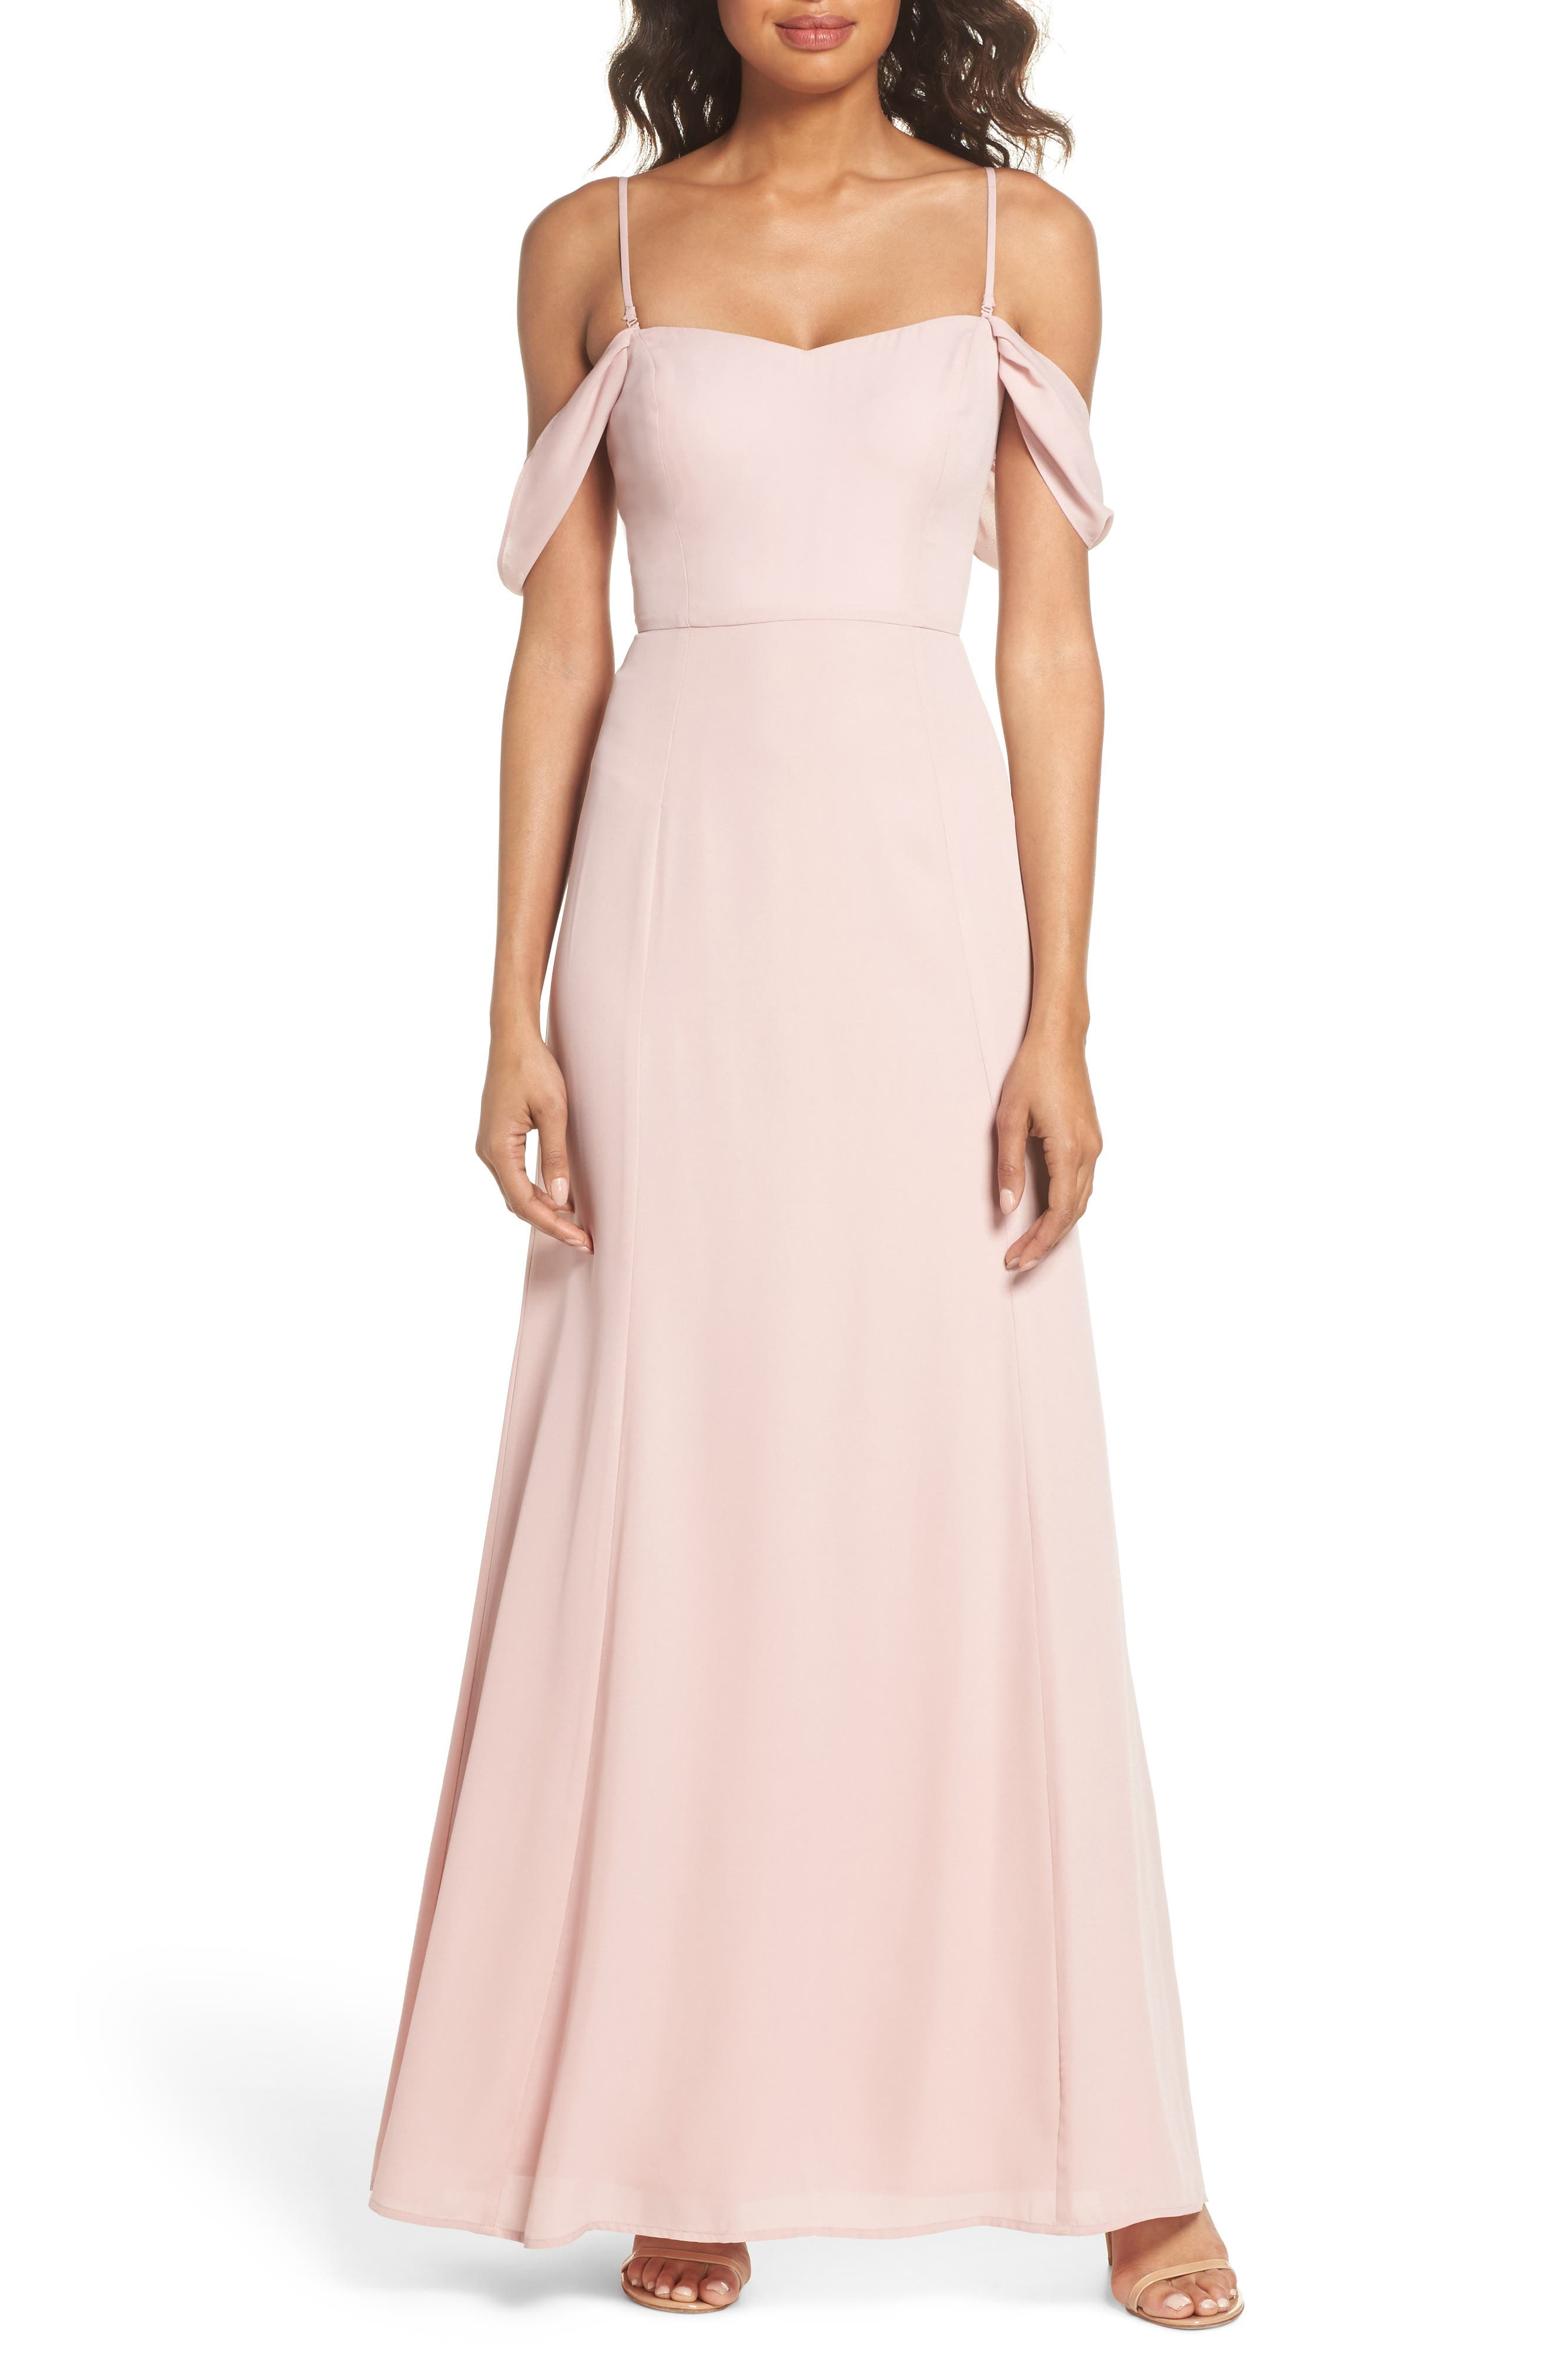 Rachel Off the Shoulder Gored Maxi Dress,                             Alternate thumbnail 7, color,